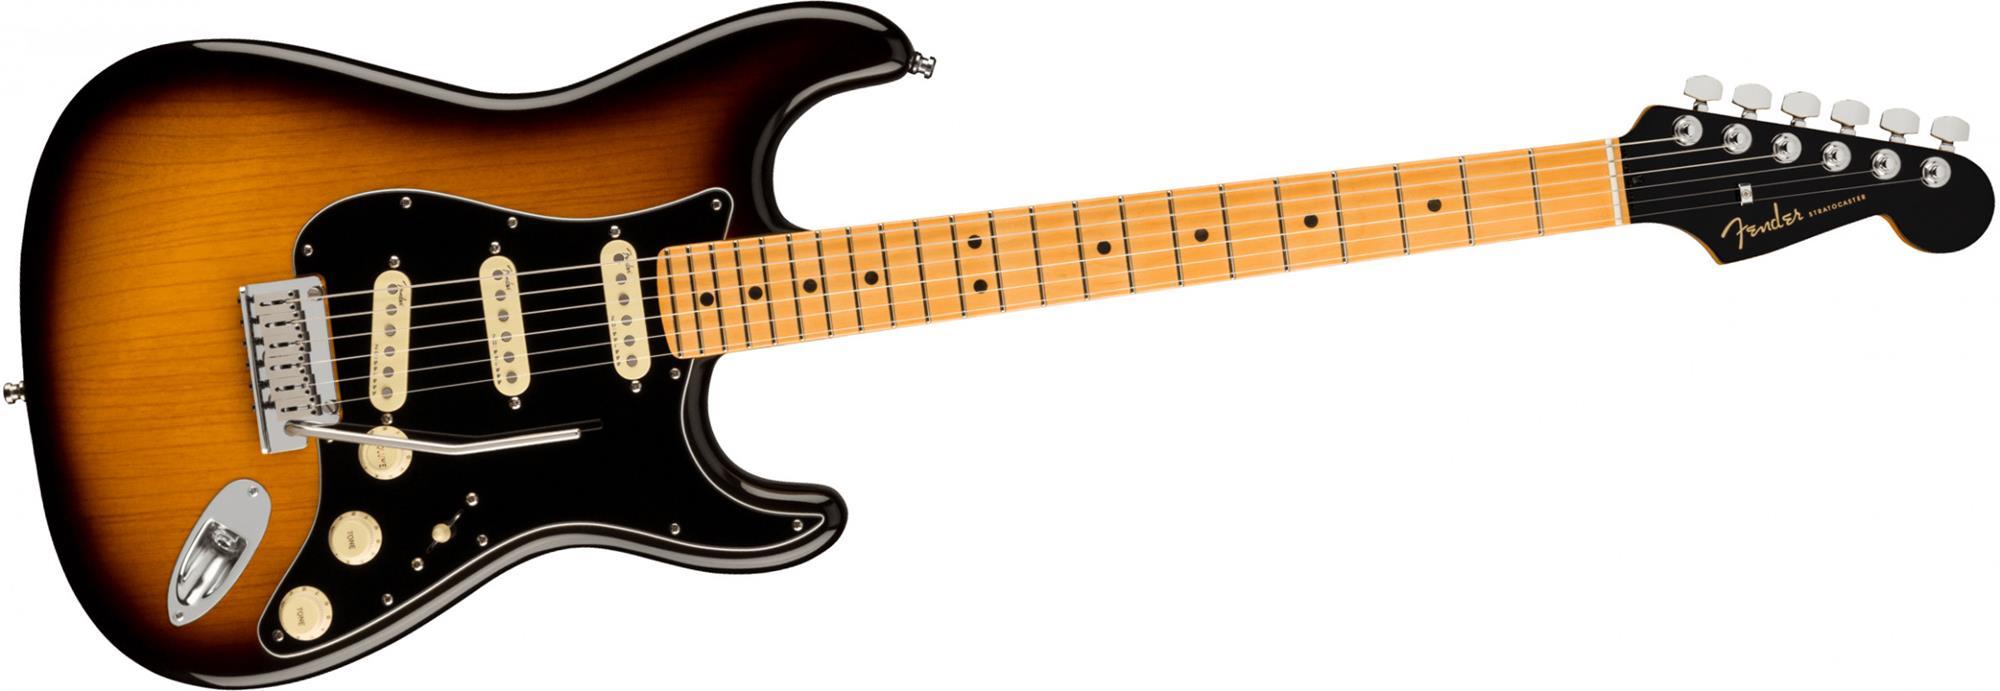 FENDER-American-Ultra-Luxe-Stratocaster-MN-2-Color-Sunburst-0118062703-sku-24751